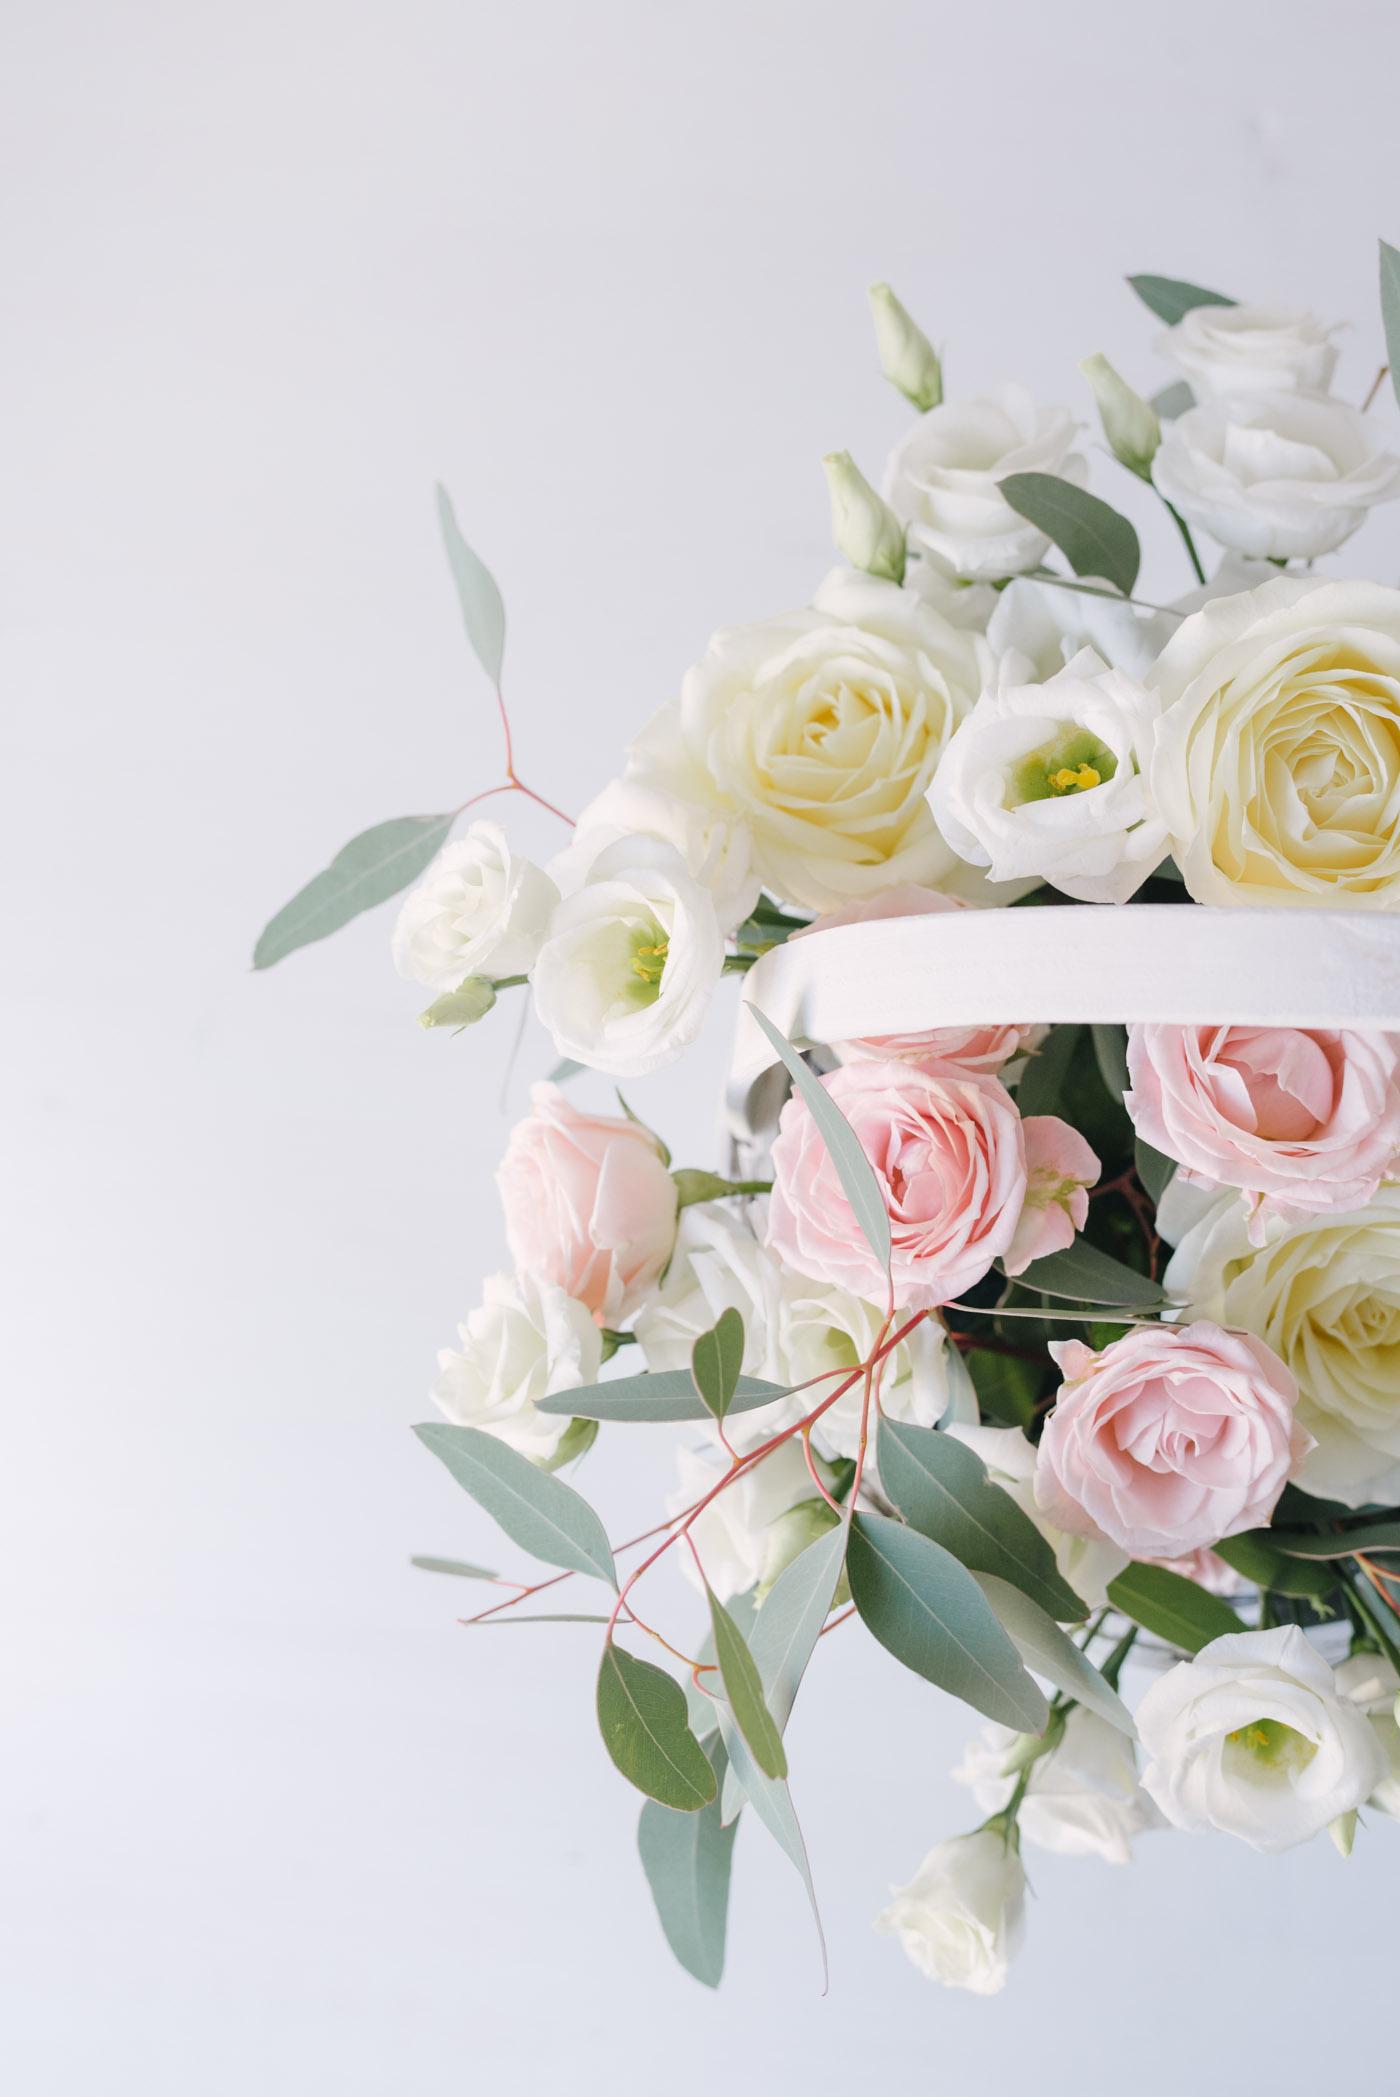 Aranjament Floral Pastelat In Cos De Rachita Mediu